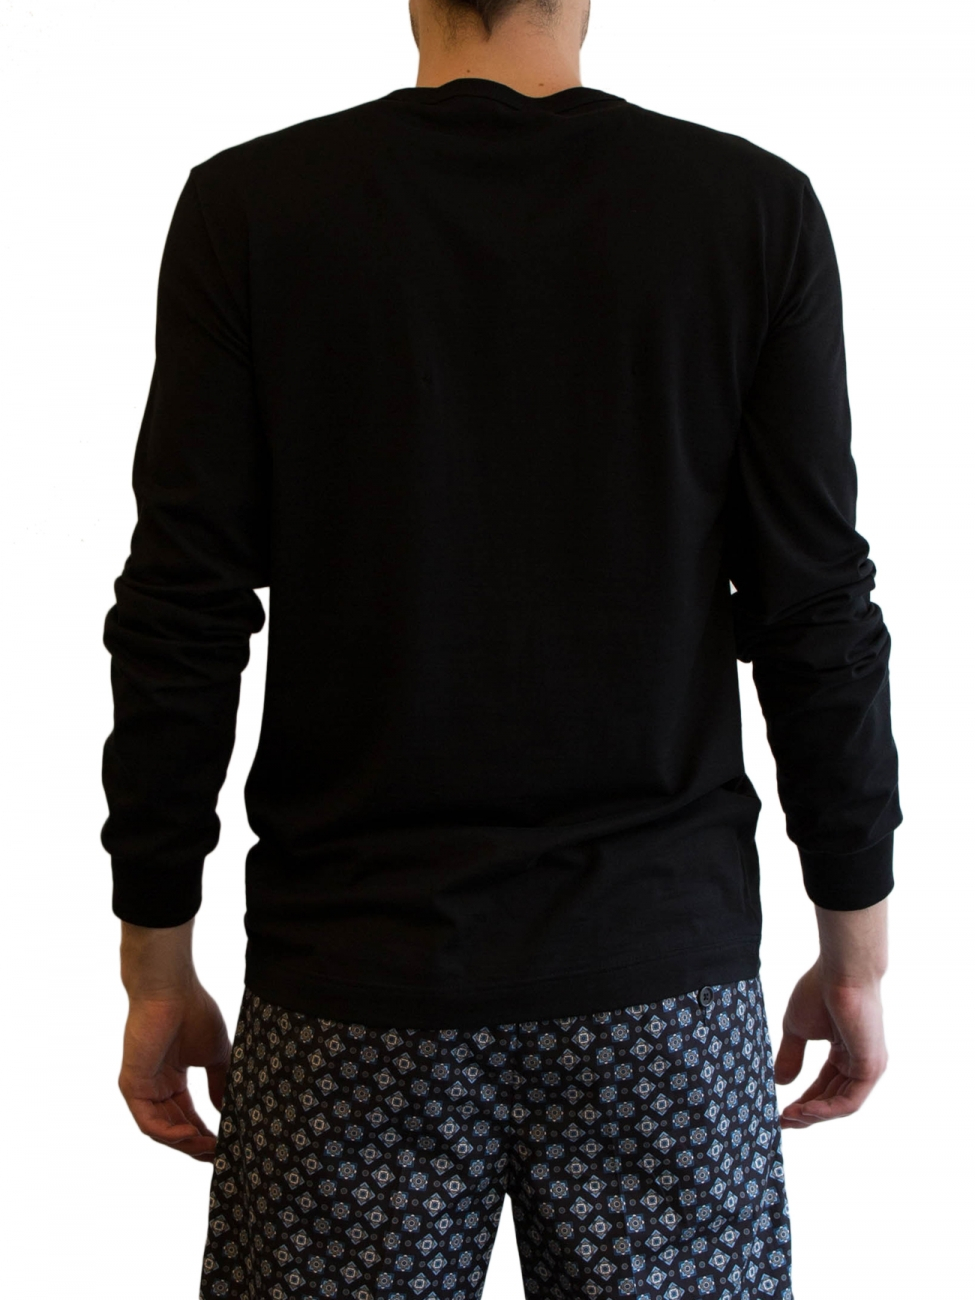 dolce gabbana black serafino t shirt in black for men lyst. Black Bedroom Furniture Sets. Home Design Ideas